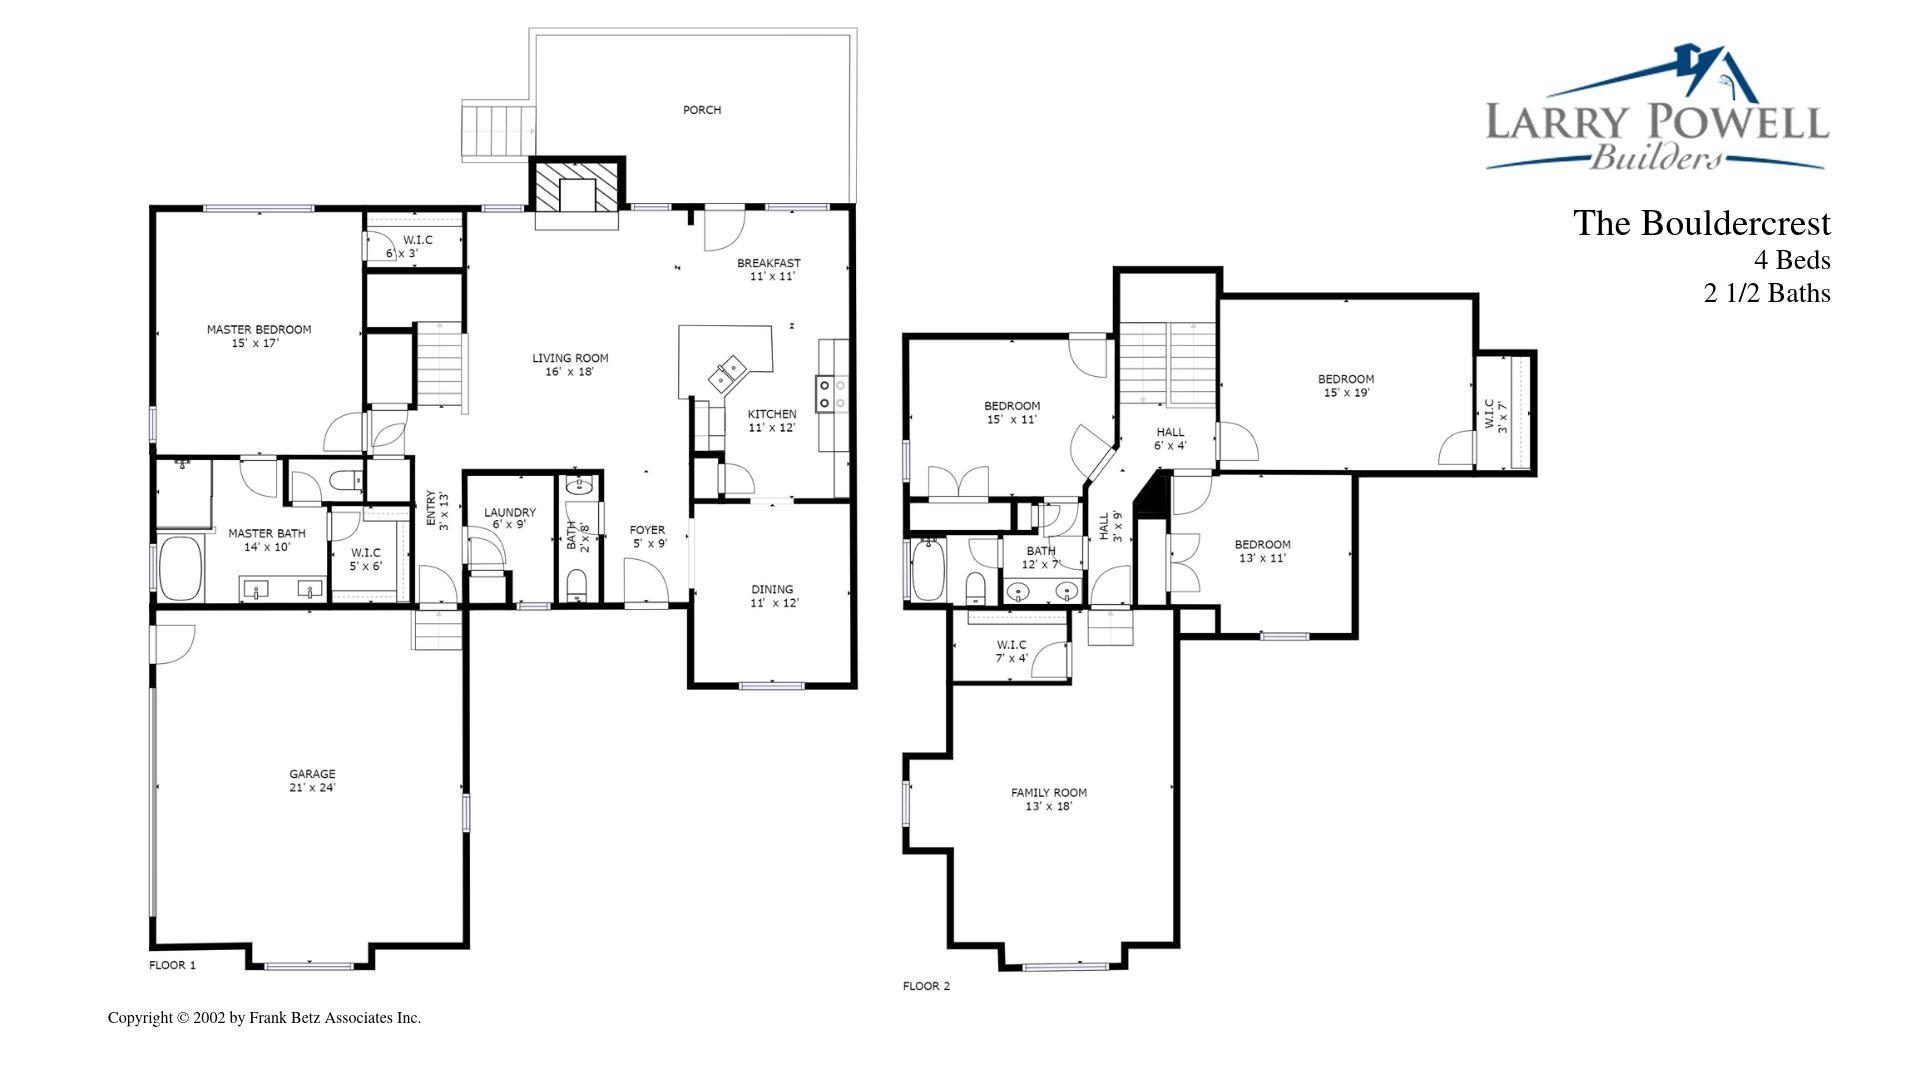 The Bouldercrest Floor Plan